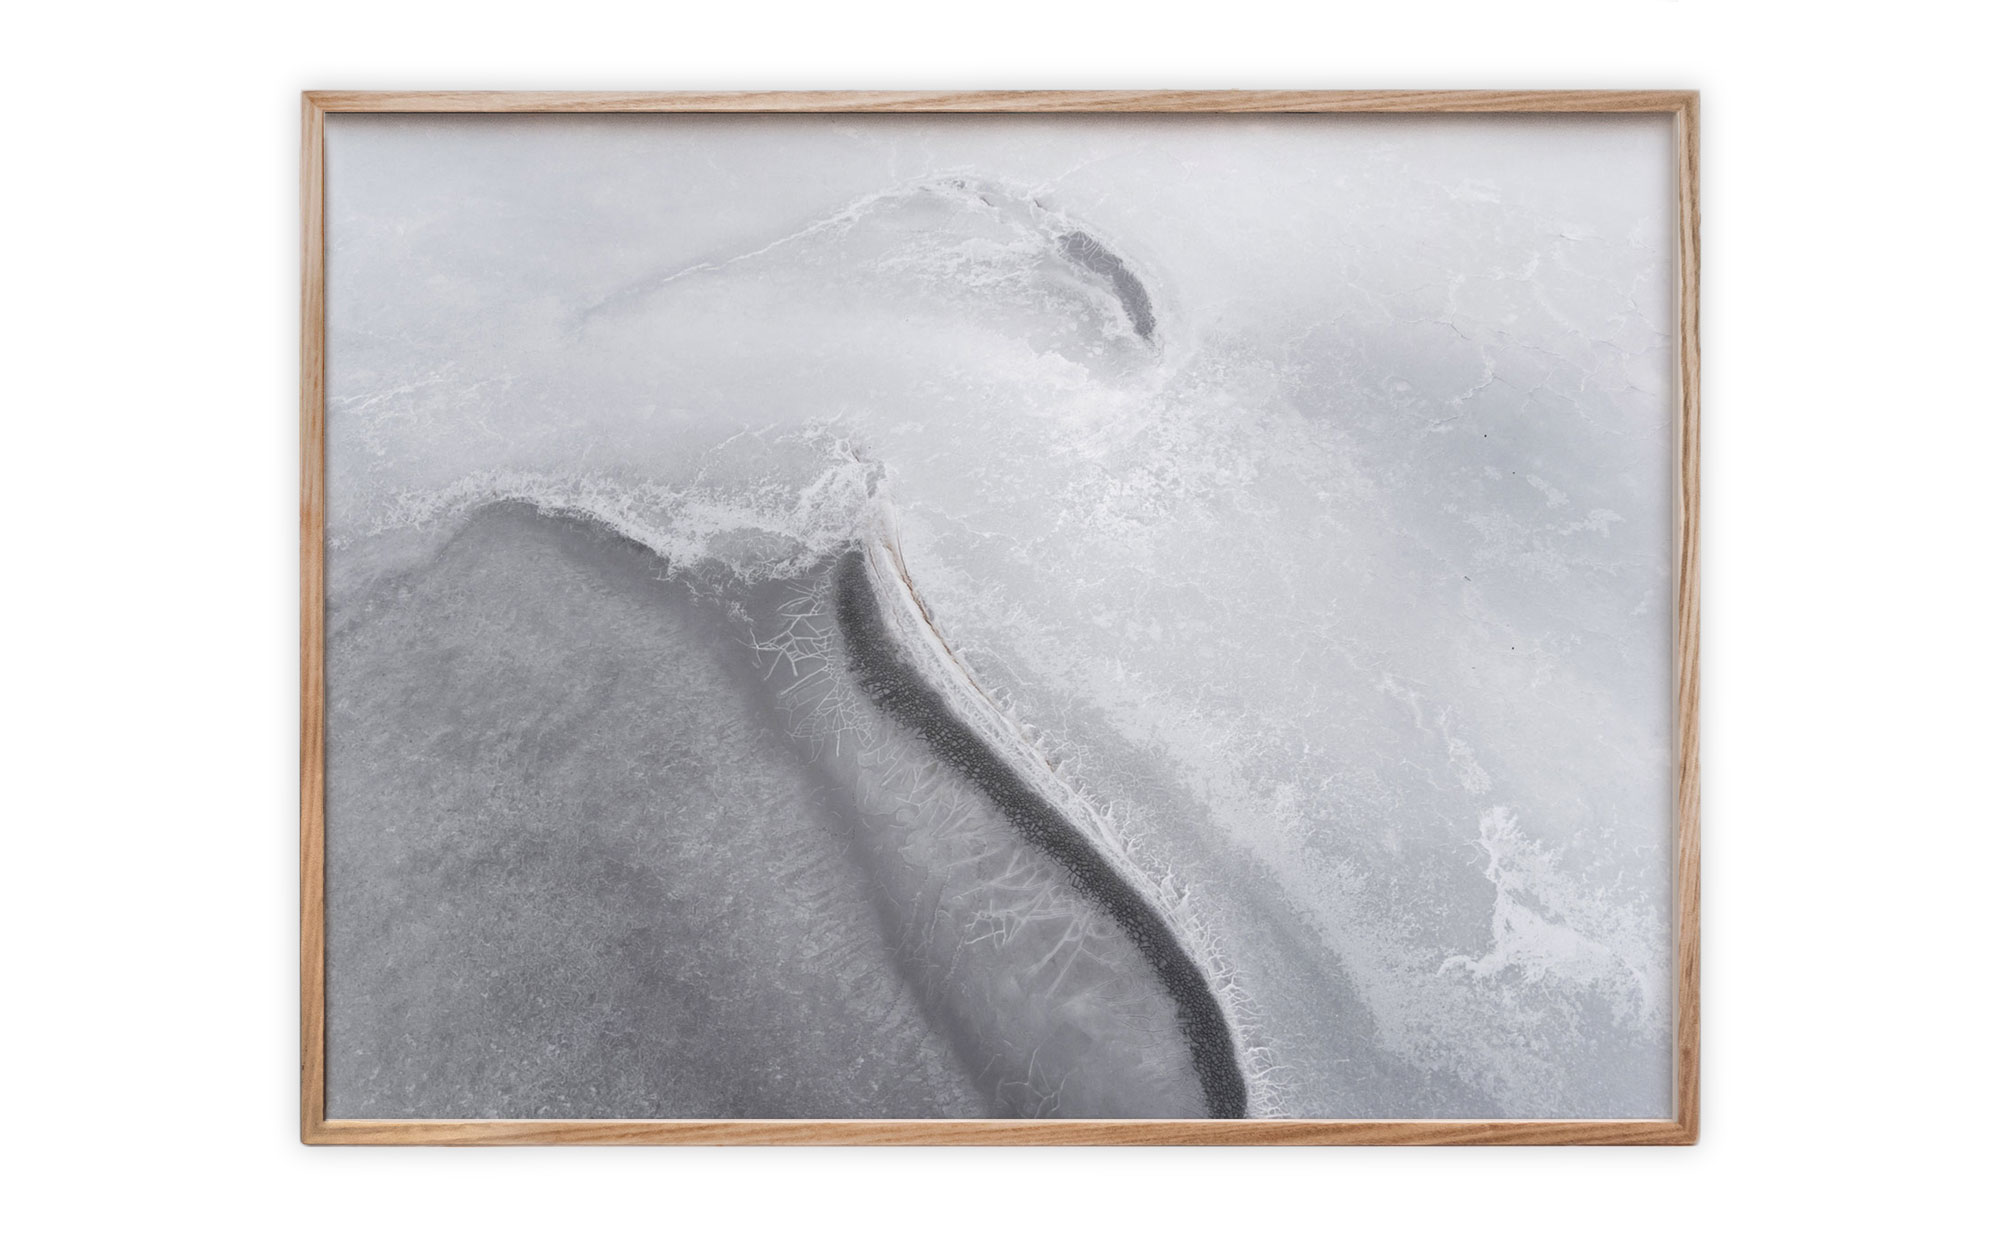 Maegan_Brown_Salt_Pleat_02_Framed_Natural.jpg